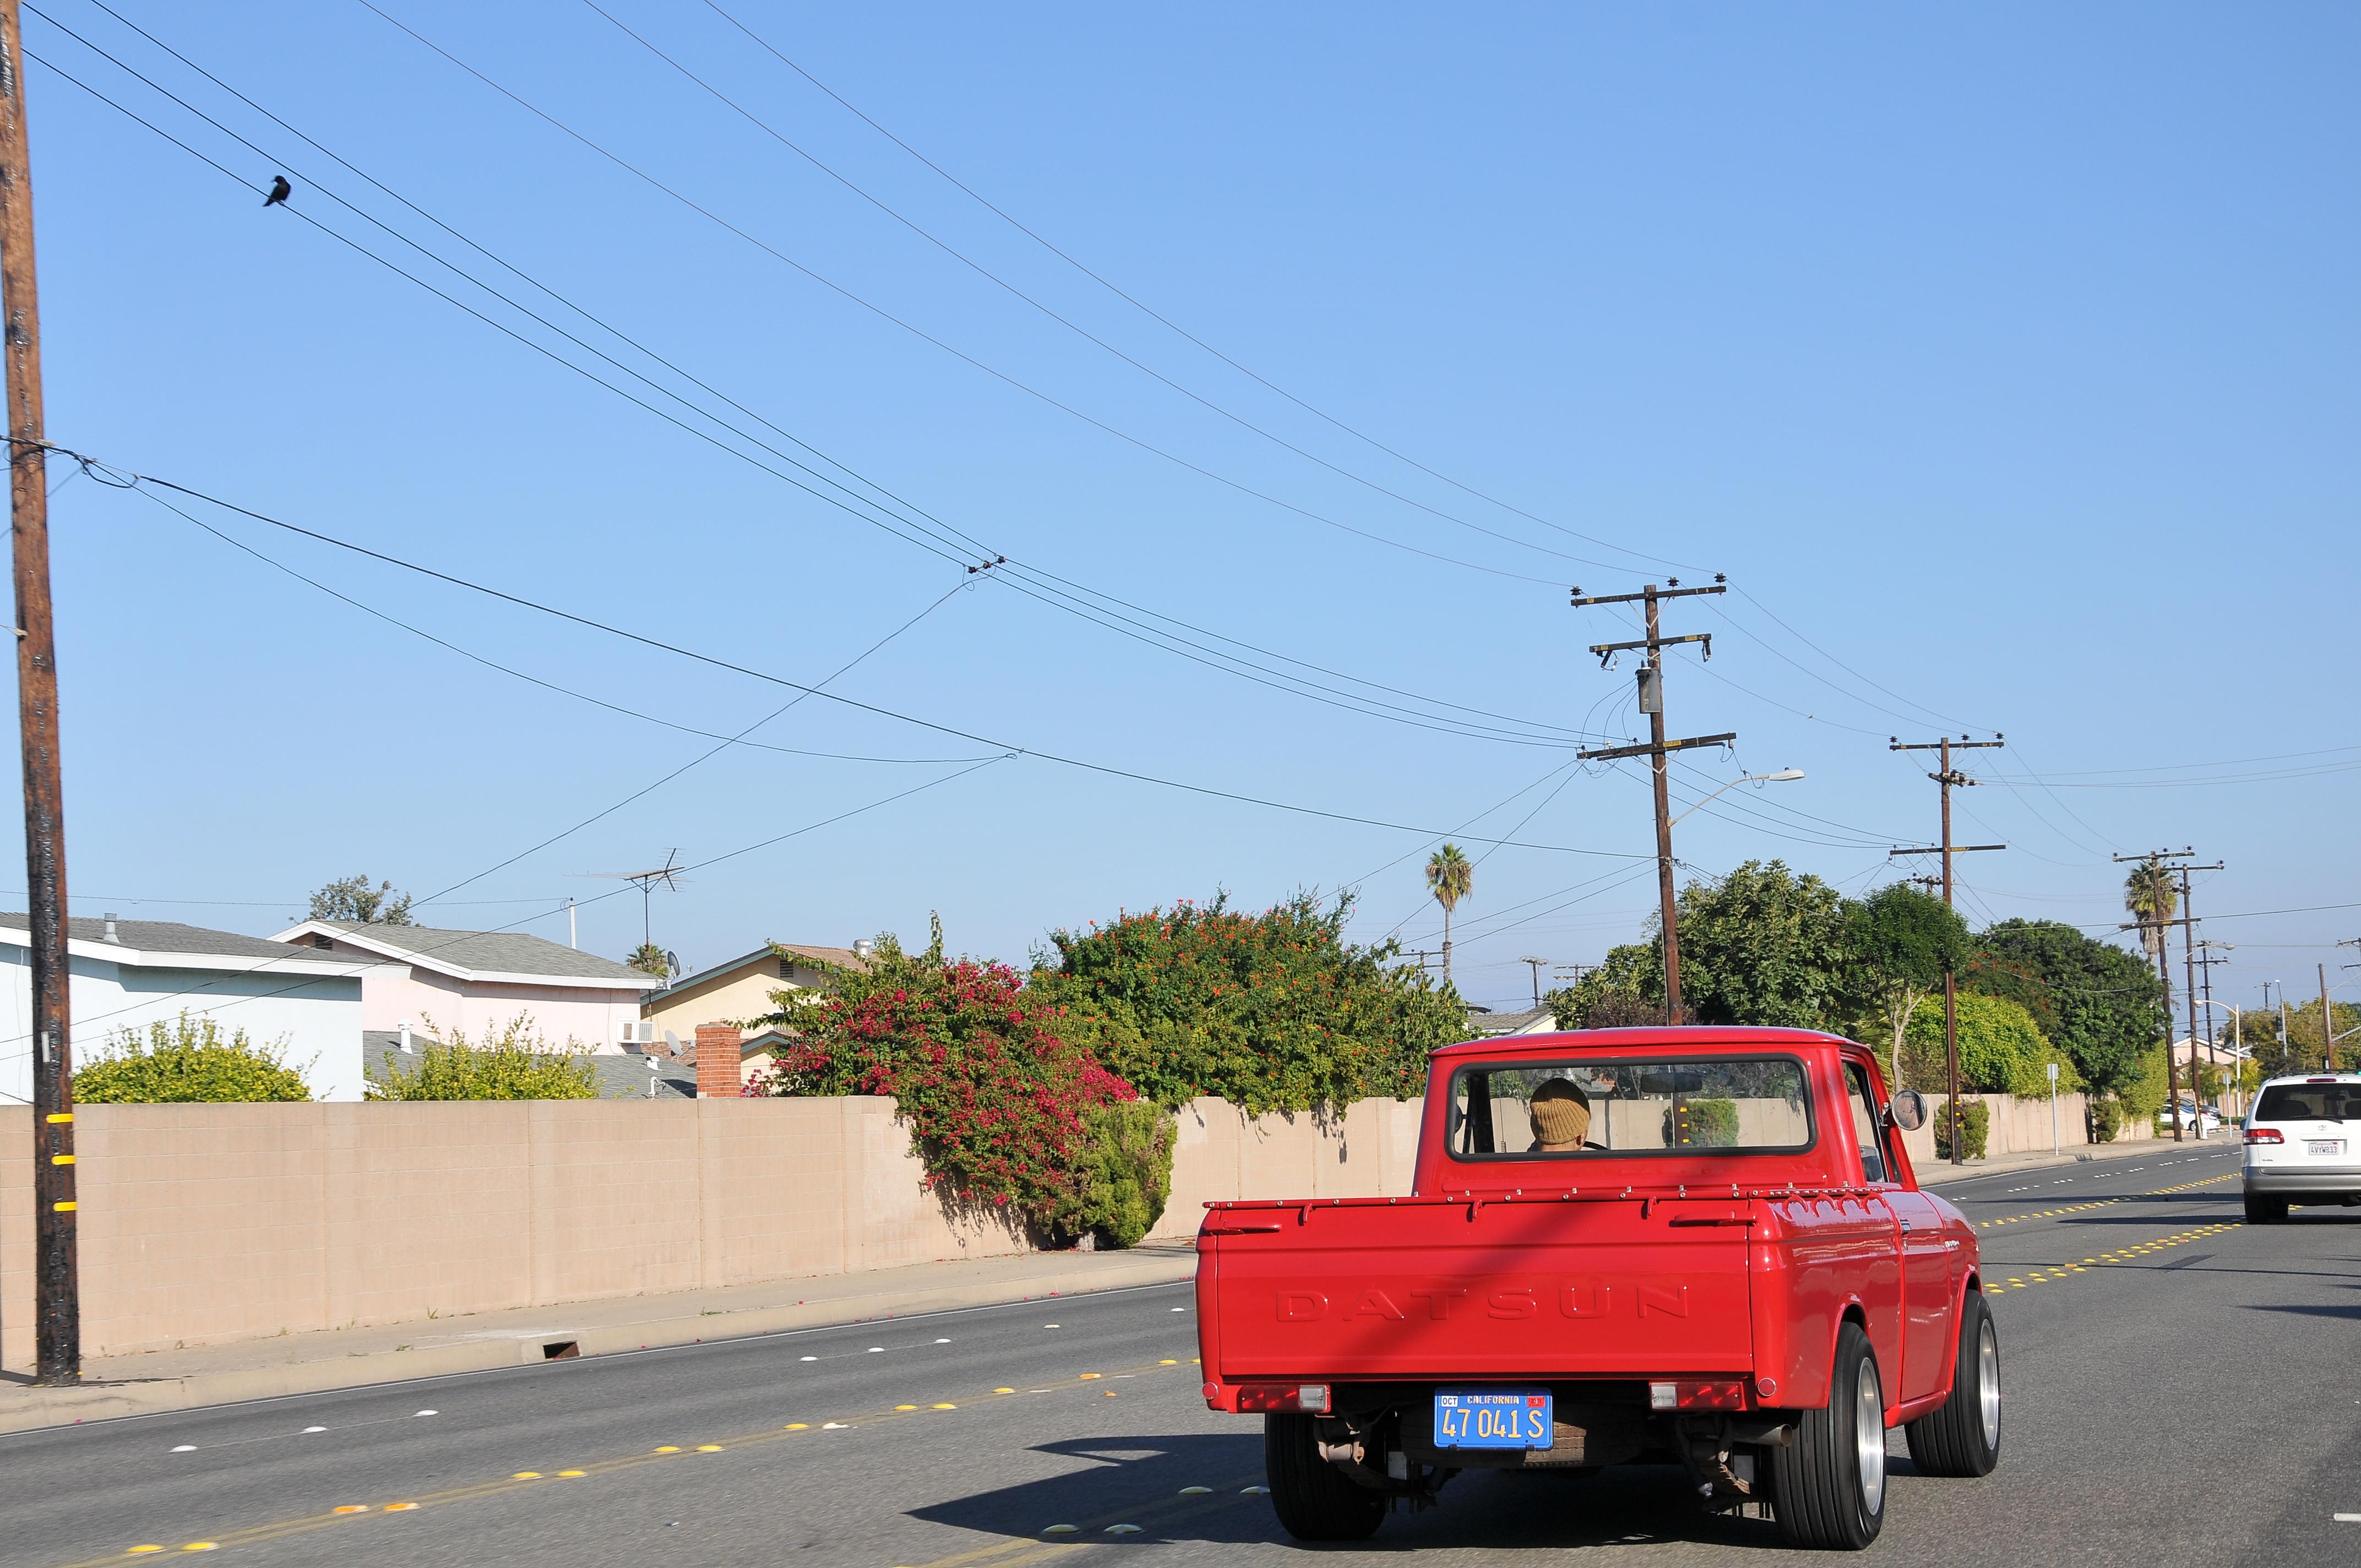 1969 Datsun 521 truck, Nissan ka24de, rear rolling shot